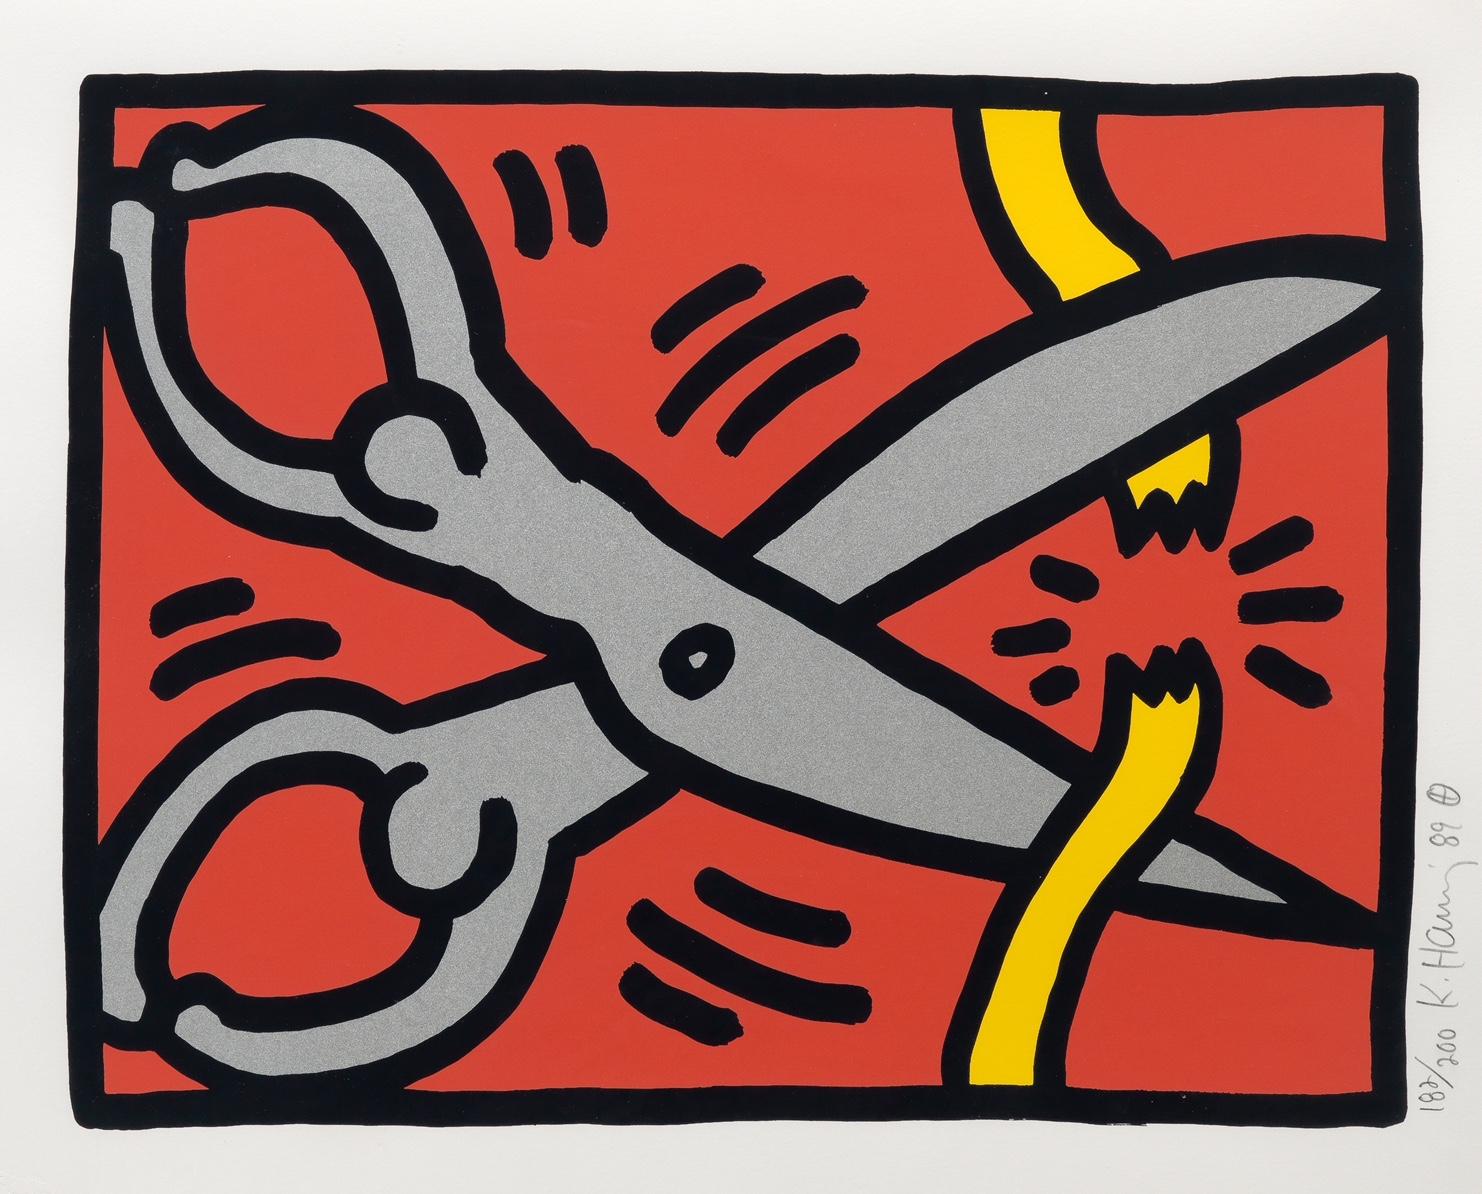 Pop Shop III, 1989 (2) by Keith Haring